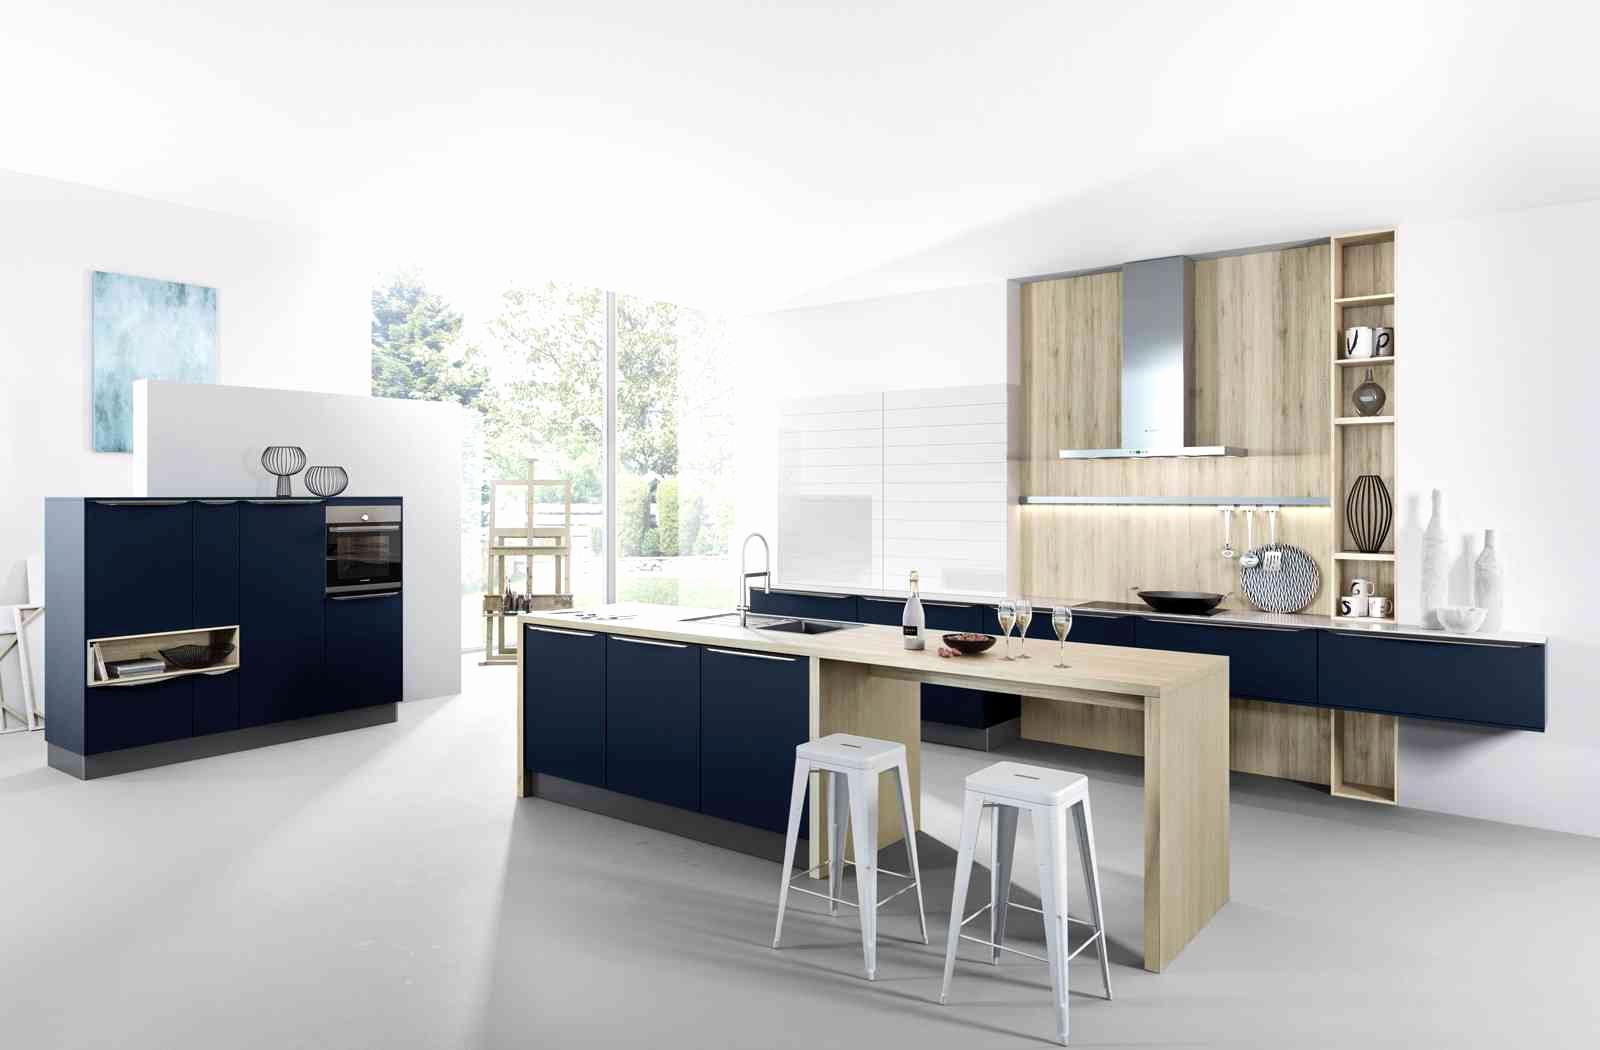 Cuisine Darty Avis 2017 Nouveau Image Electromenager Ikea Avis Nouveau Cuisiniste Quimper Inspirational